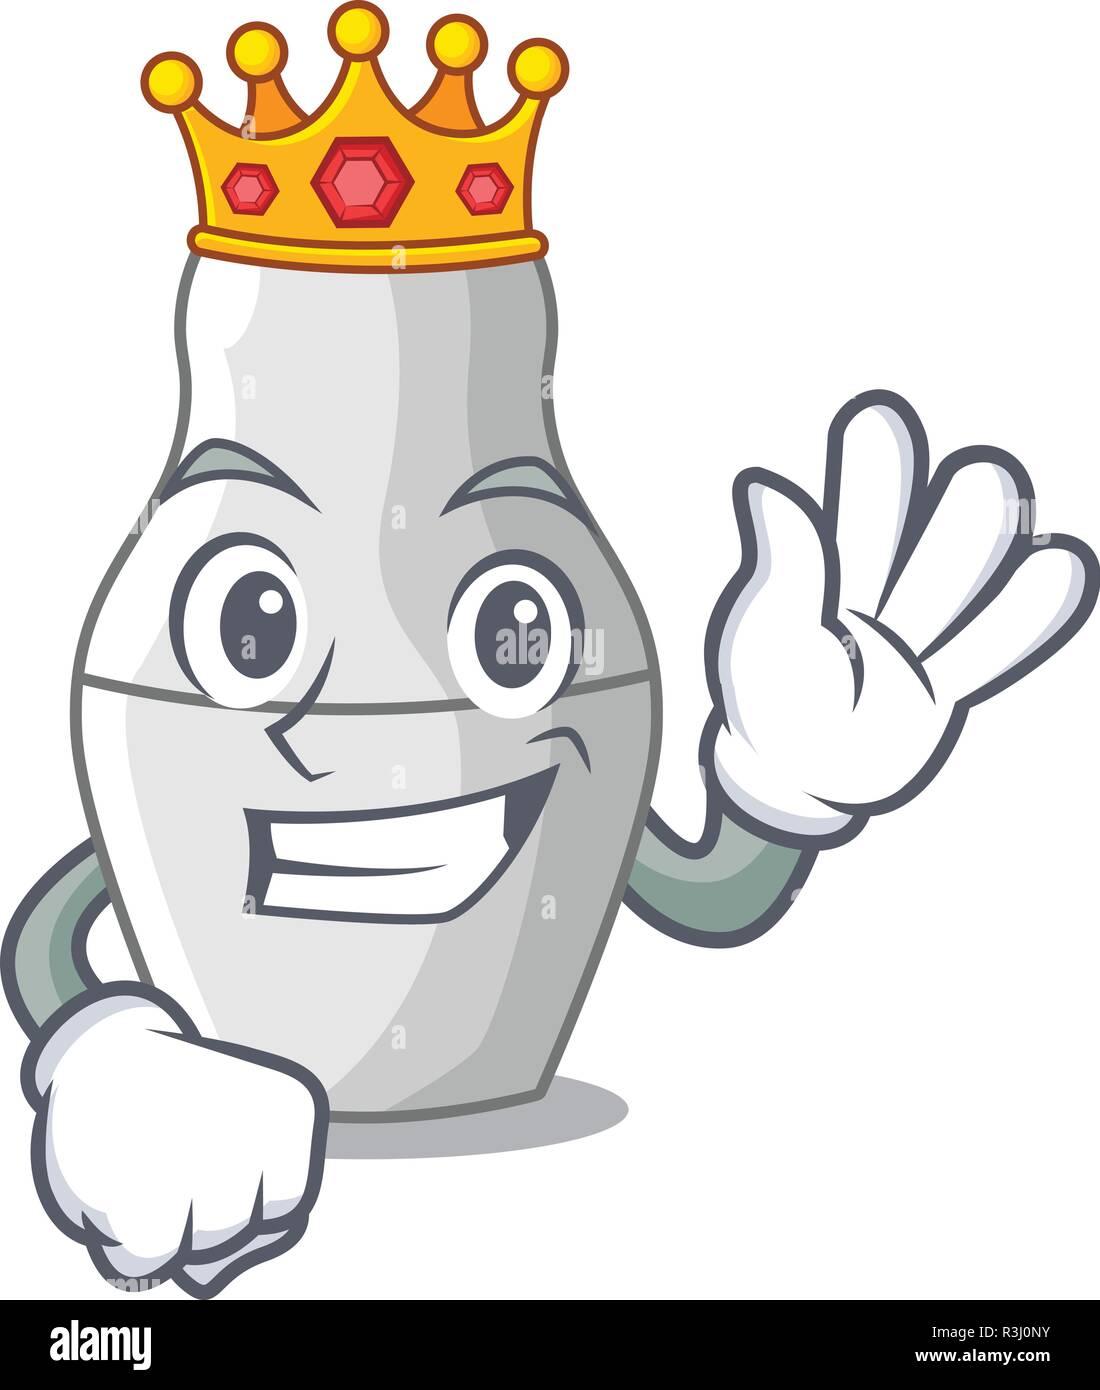 King nesting doll russian matryoshka on mascot - Stock Image